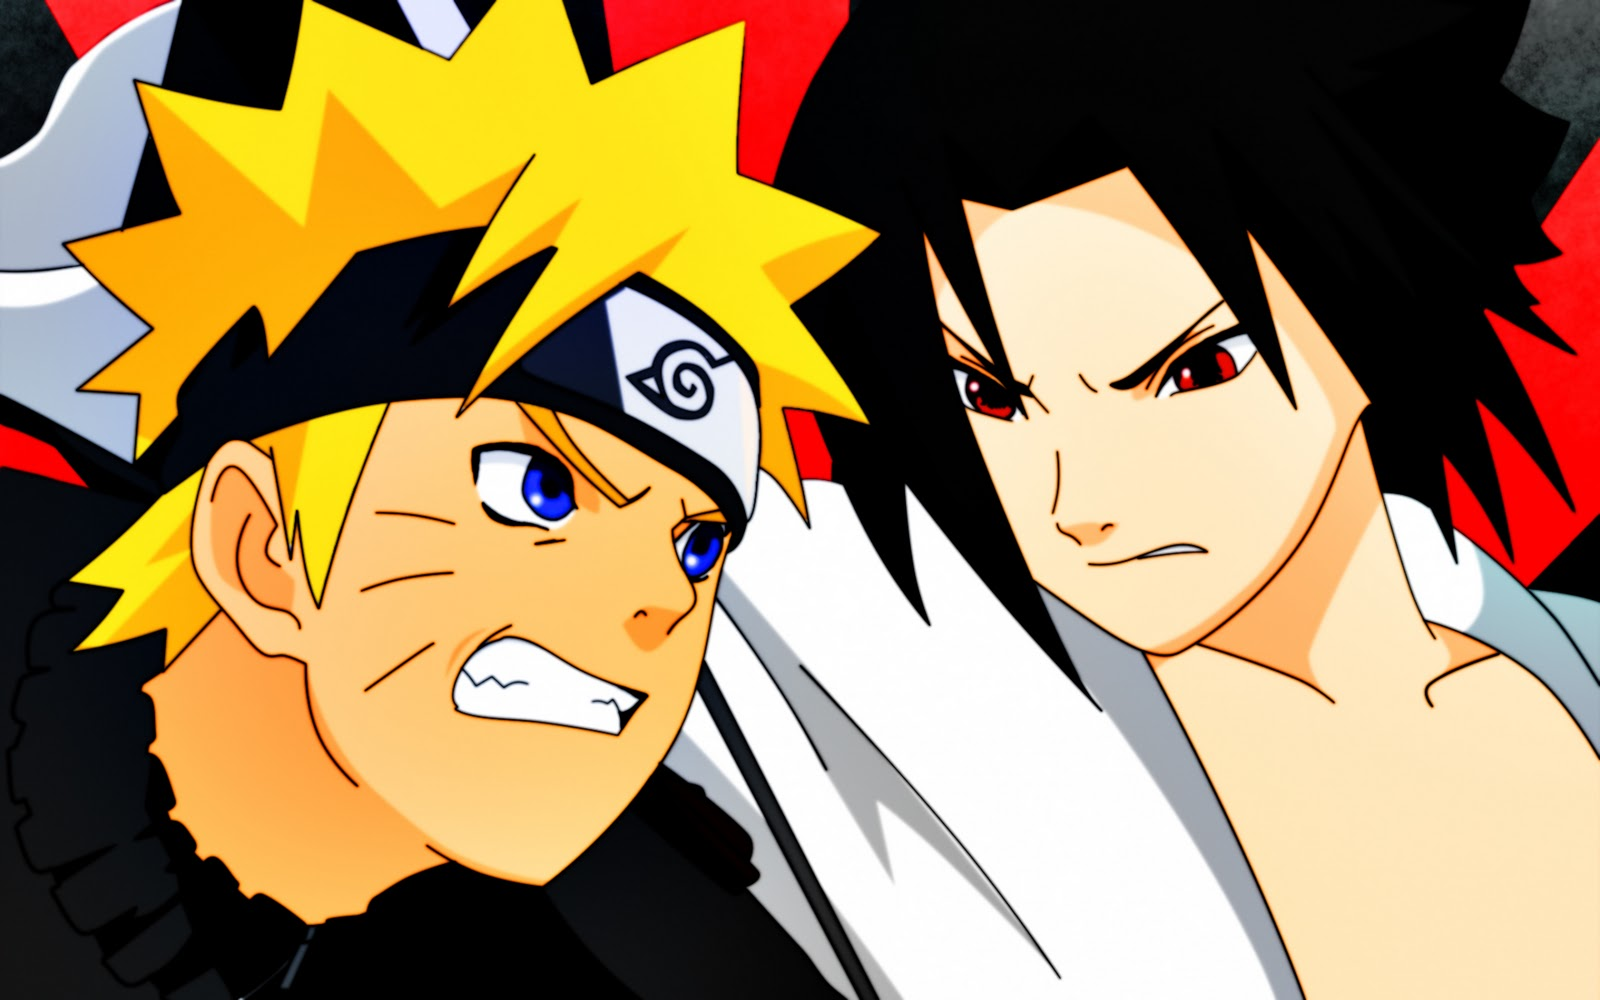 Free Download Film Naruto Kumpulan Wallpaper Dan Gambar Naruto